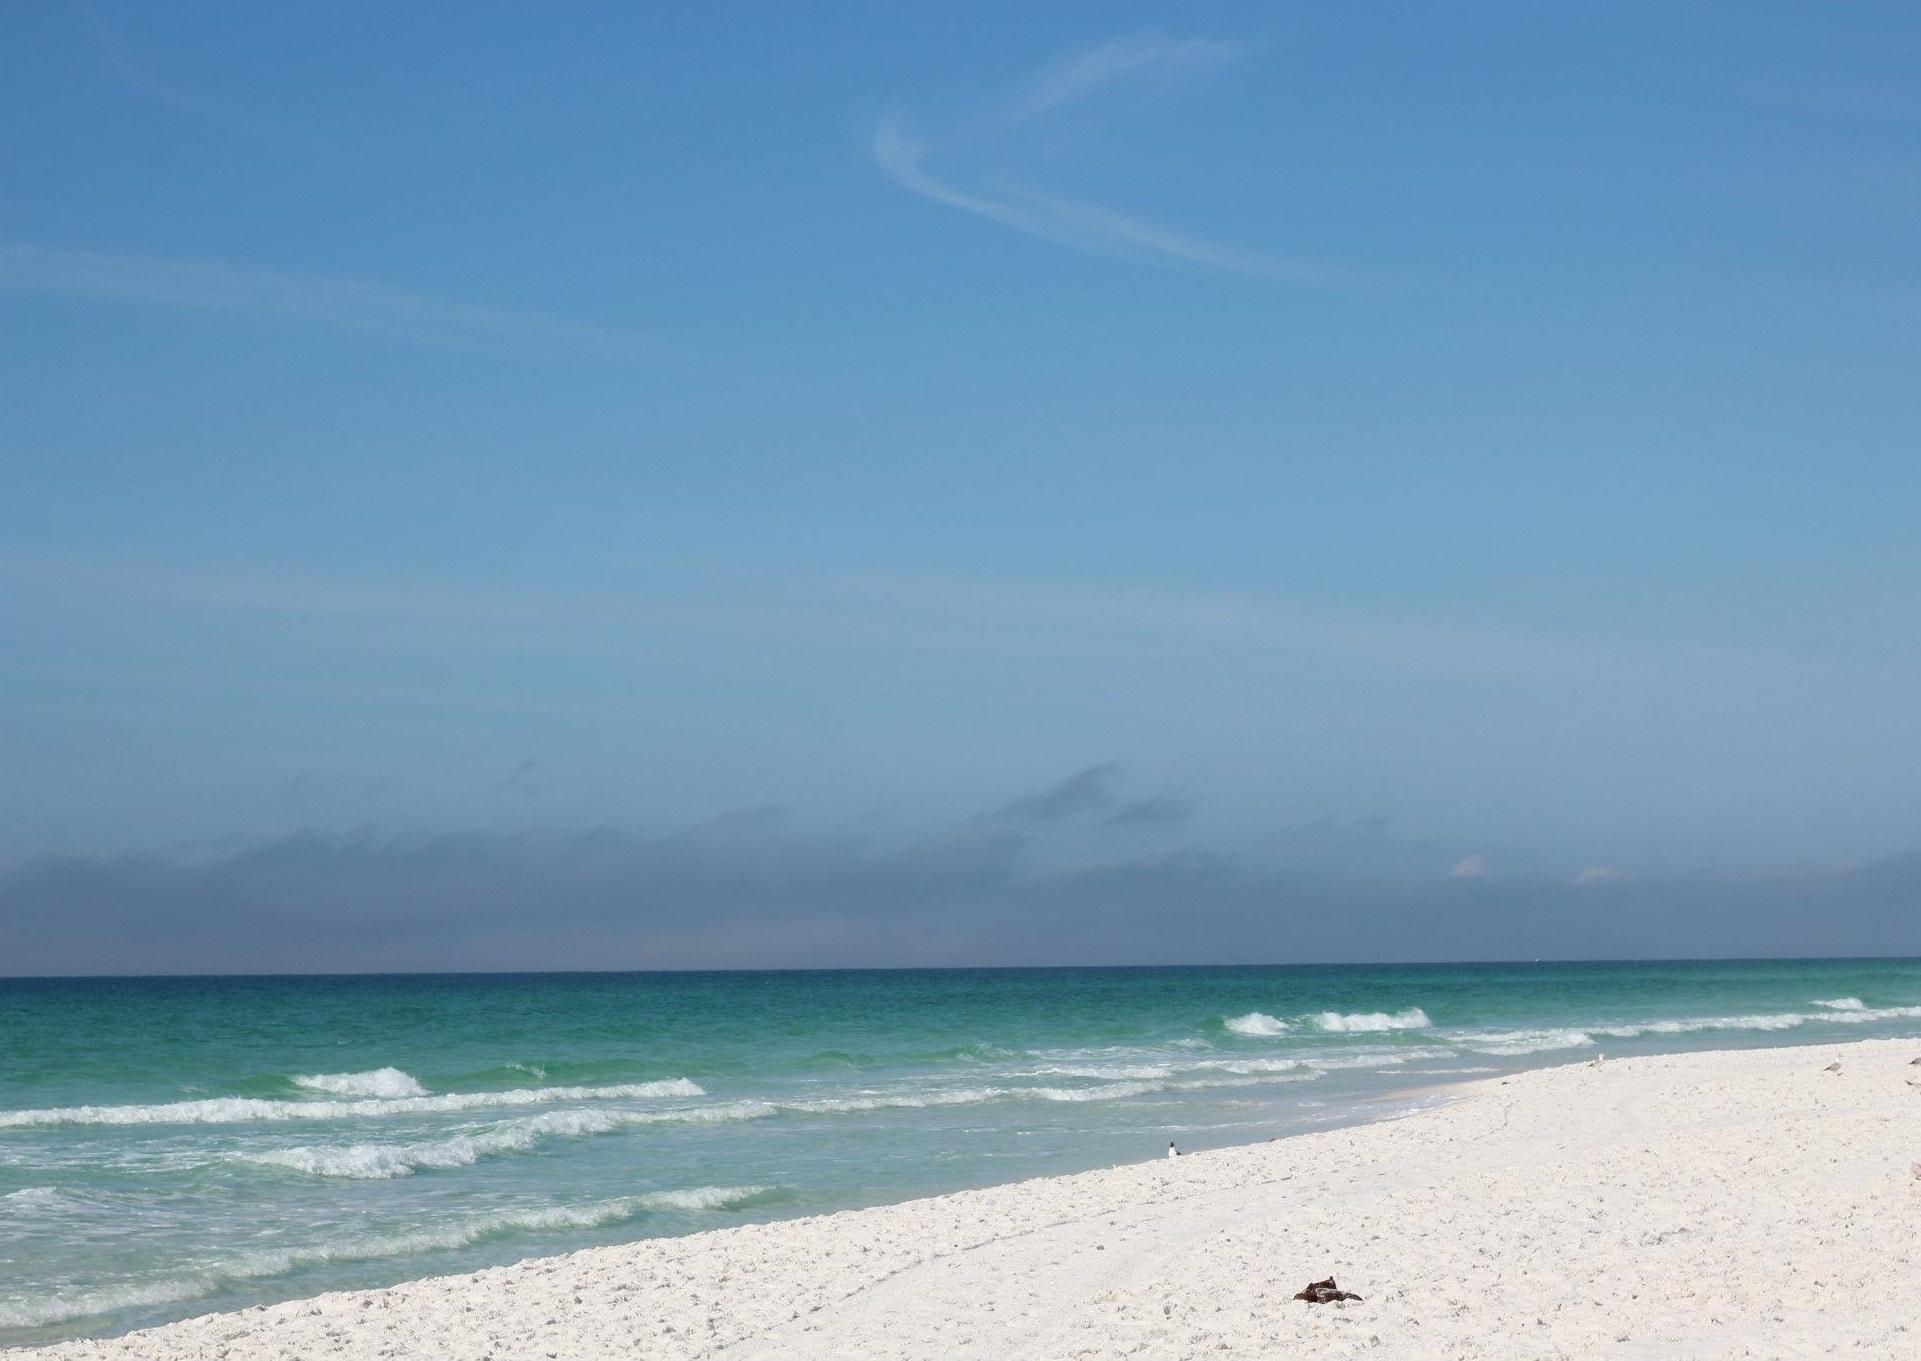 Photo by Bougie Black Girl Fort Walton, FL